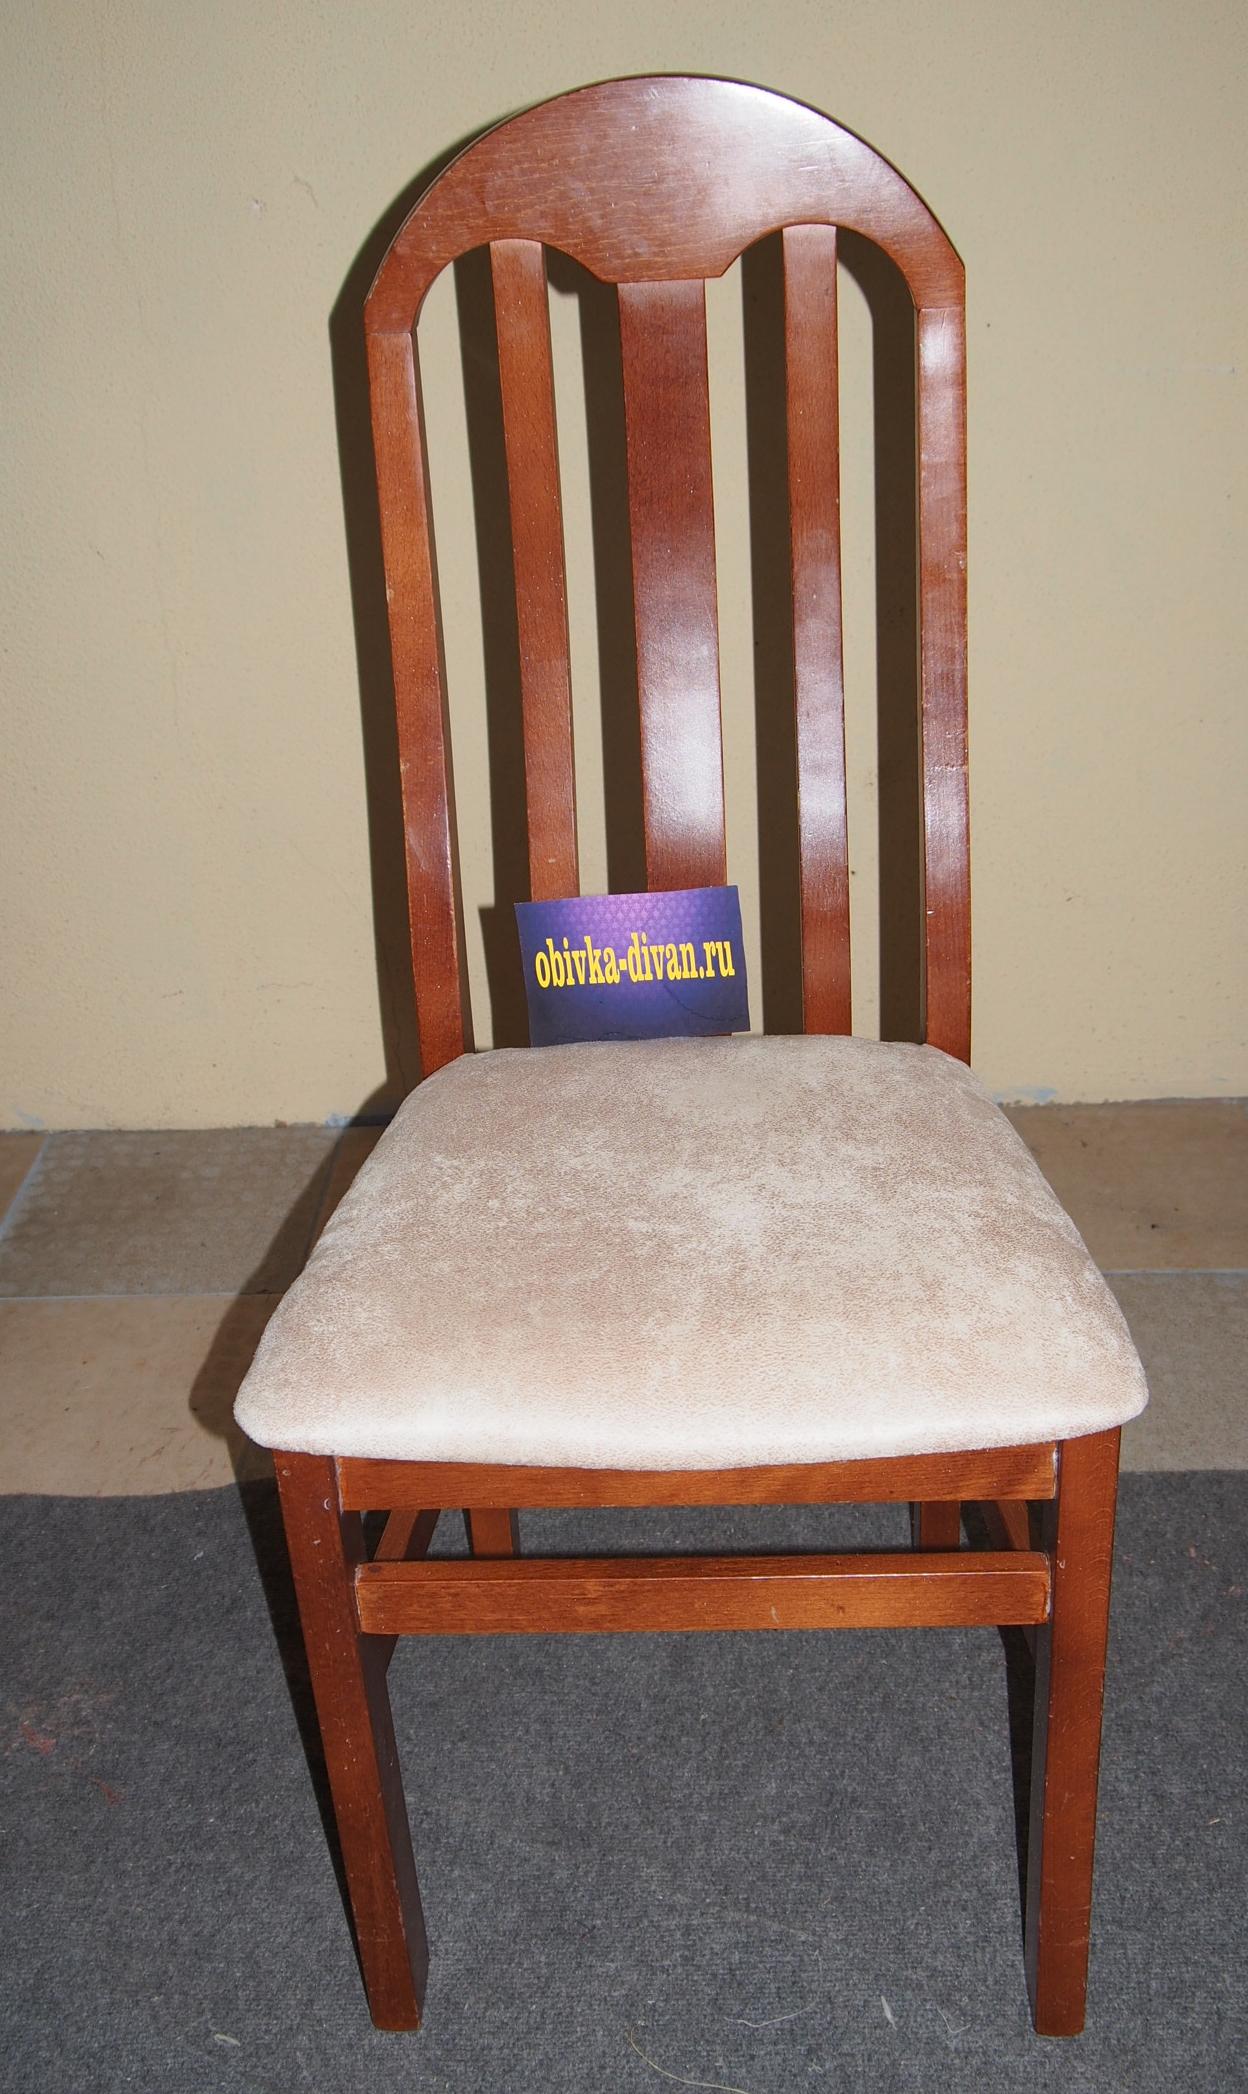 Upholstery- How to Diamond Tuft Мебель, Обивка и Мягкая 17